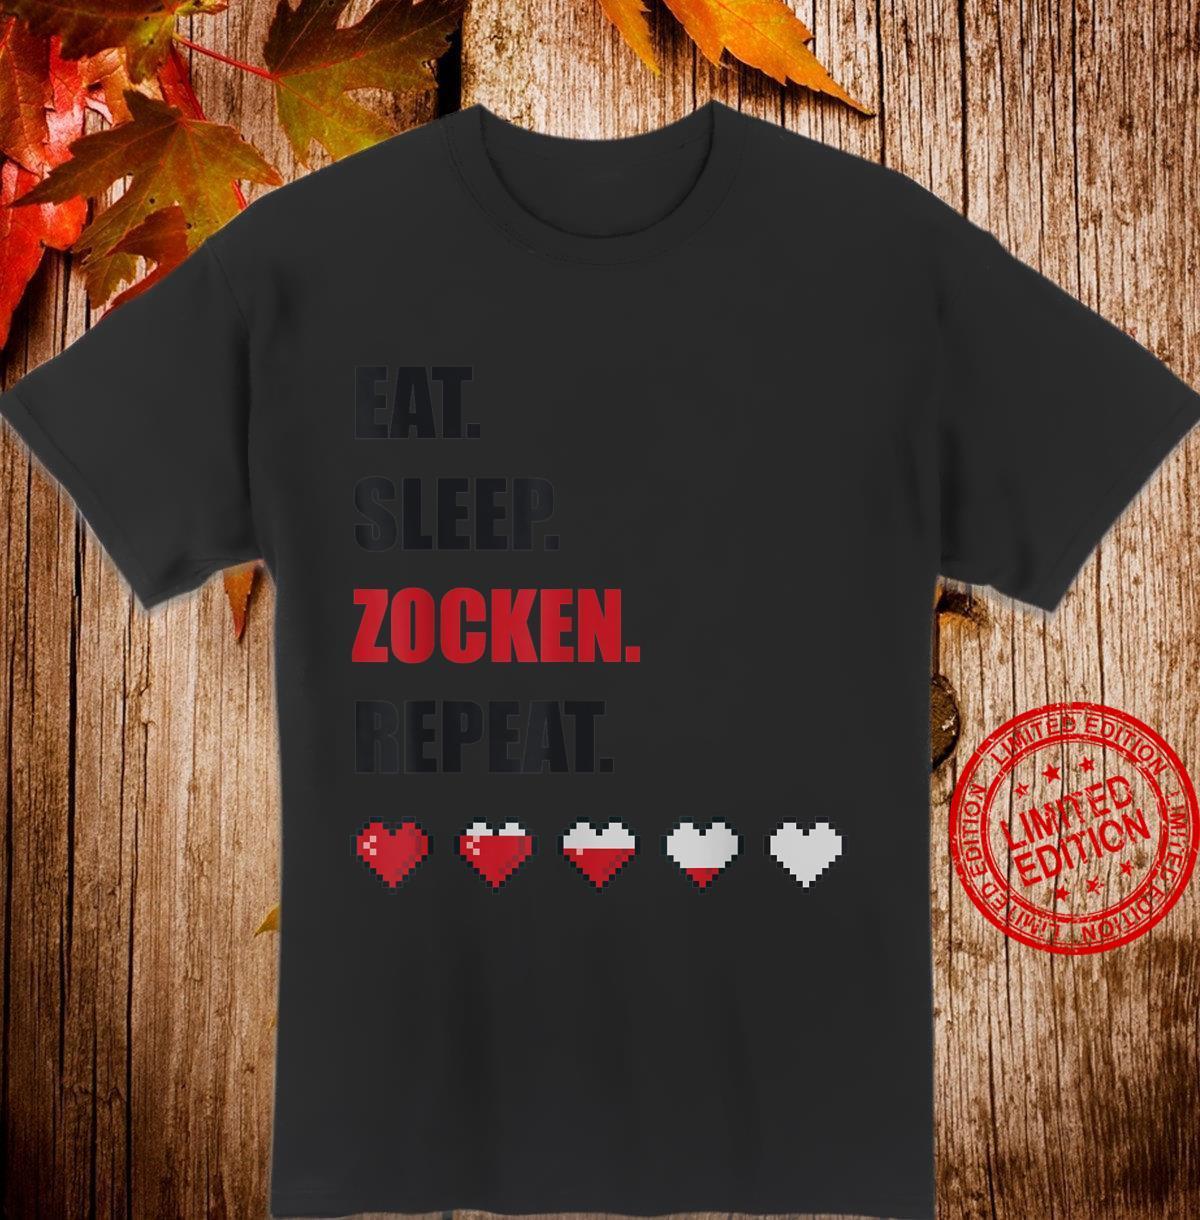 Eat sleep zocken Gamer Gaming lustiges Geschenk Shirt